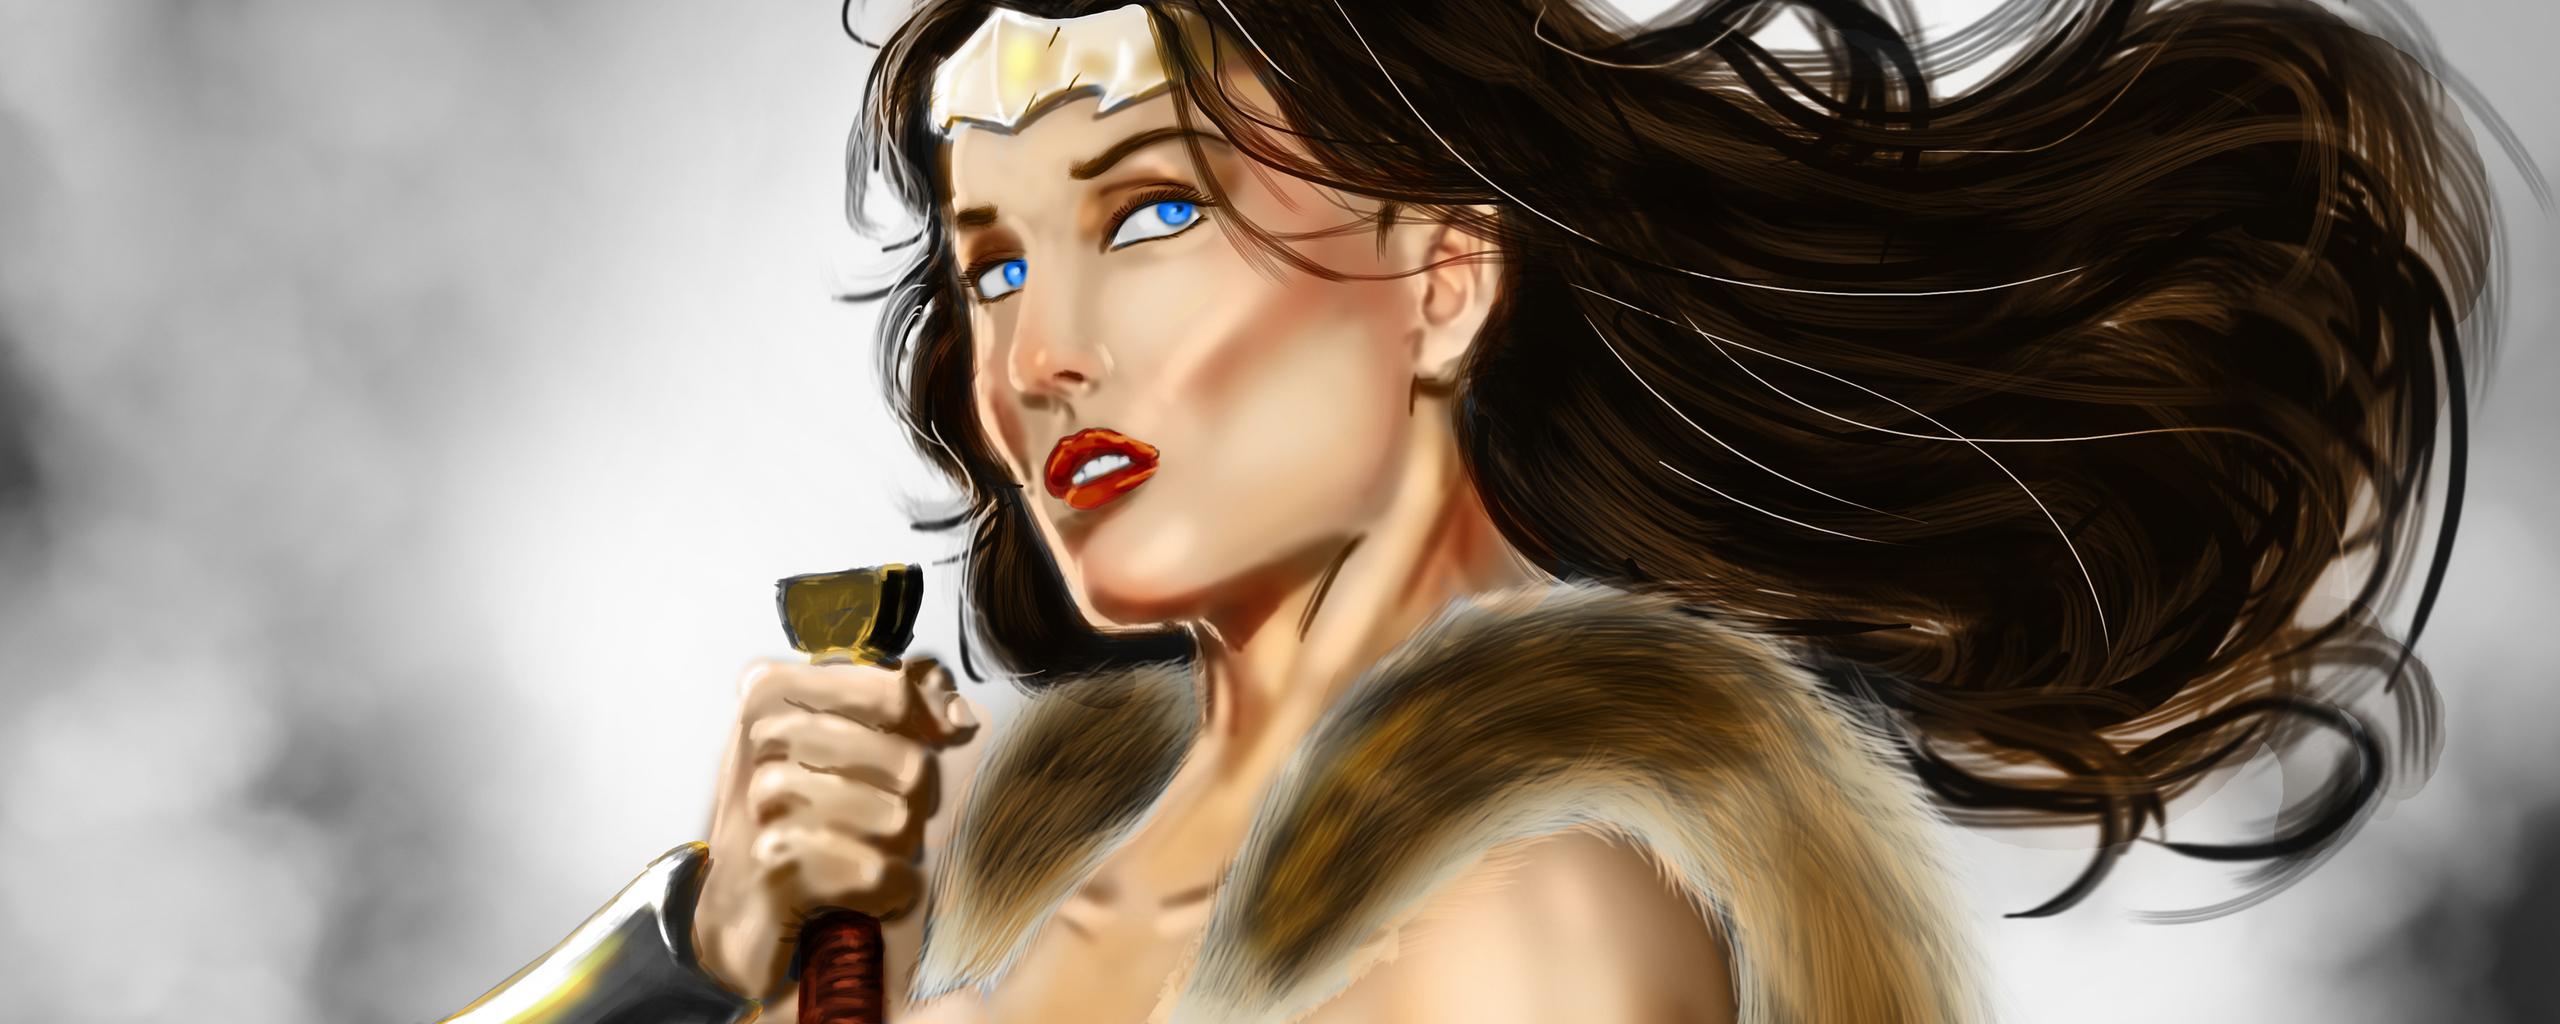 4k-wonder-woman-paint-artwork-gt.jpg